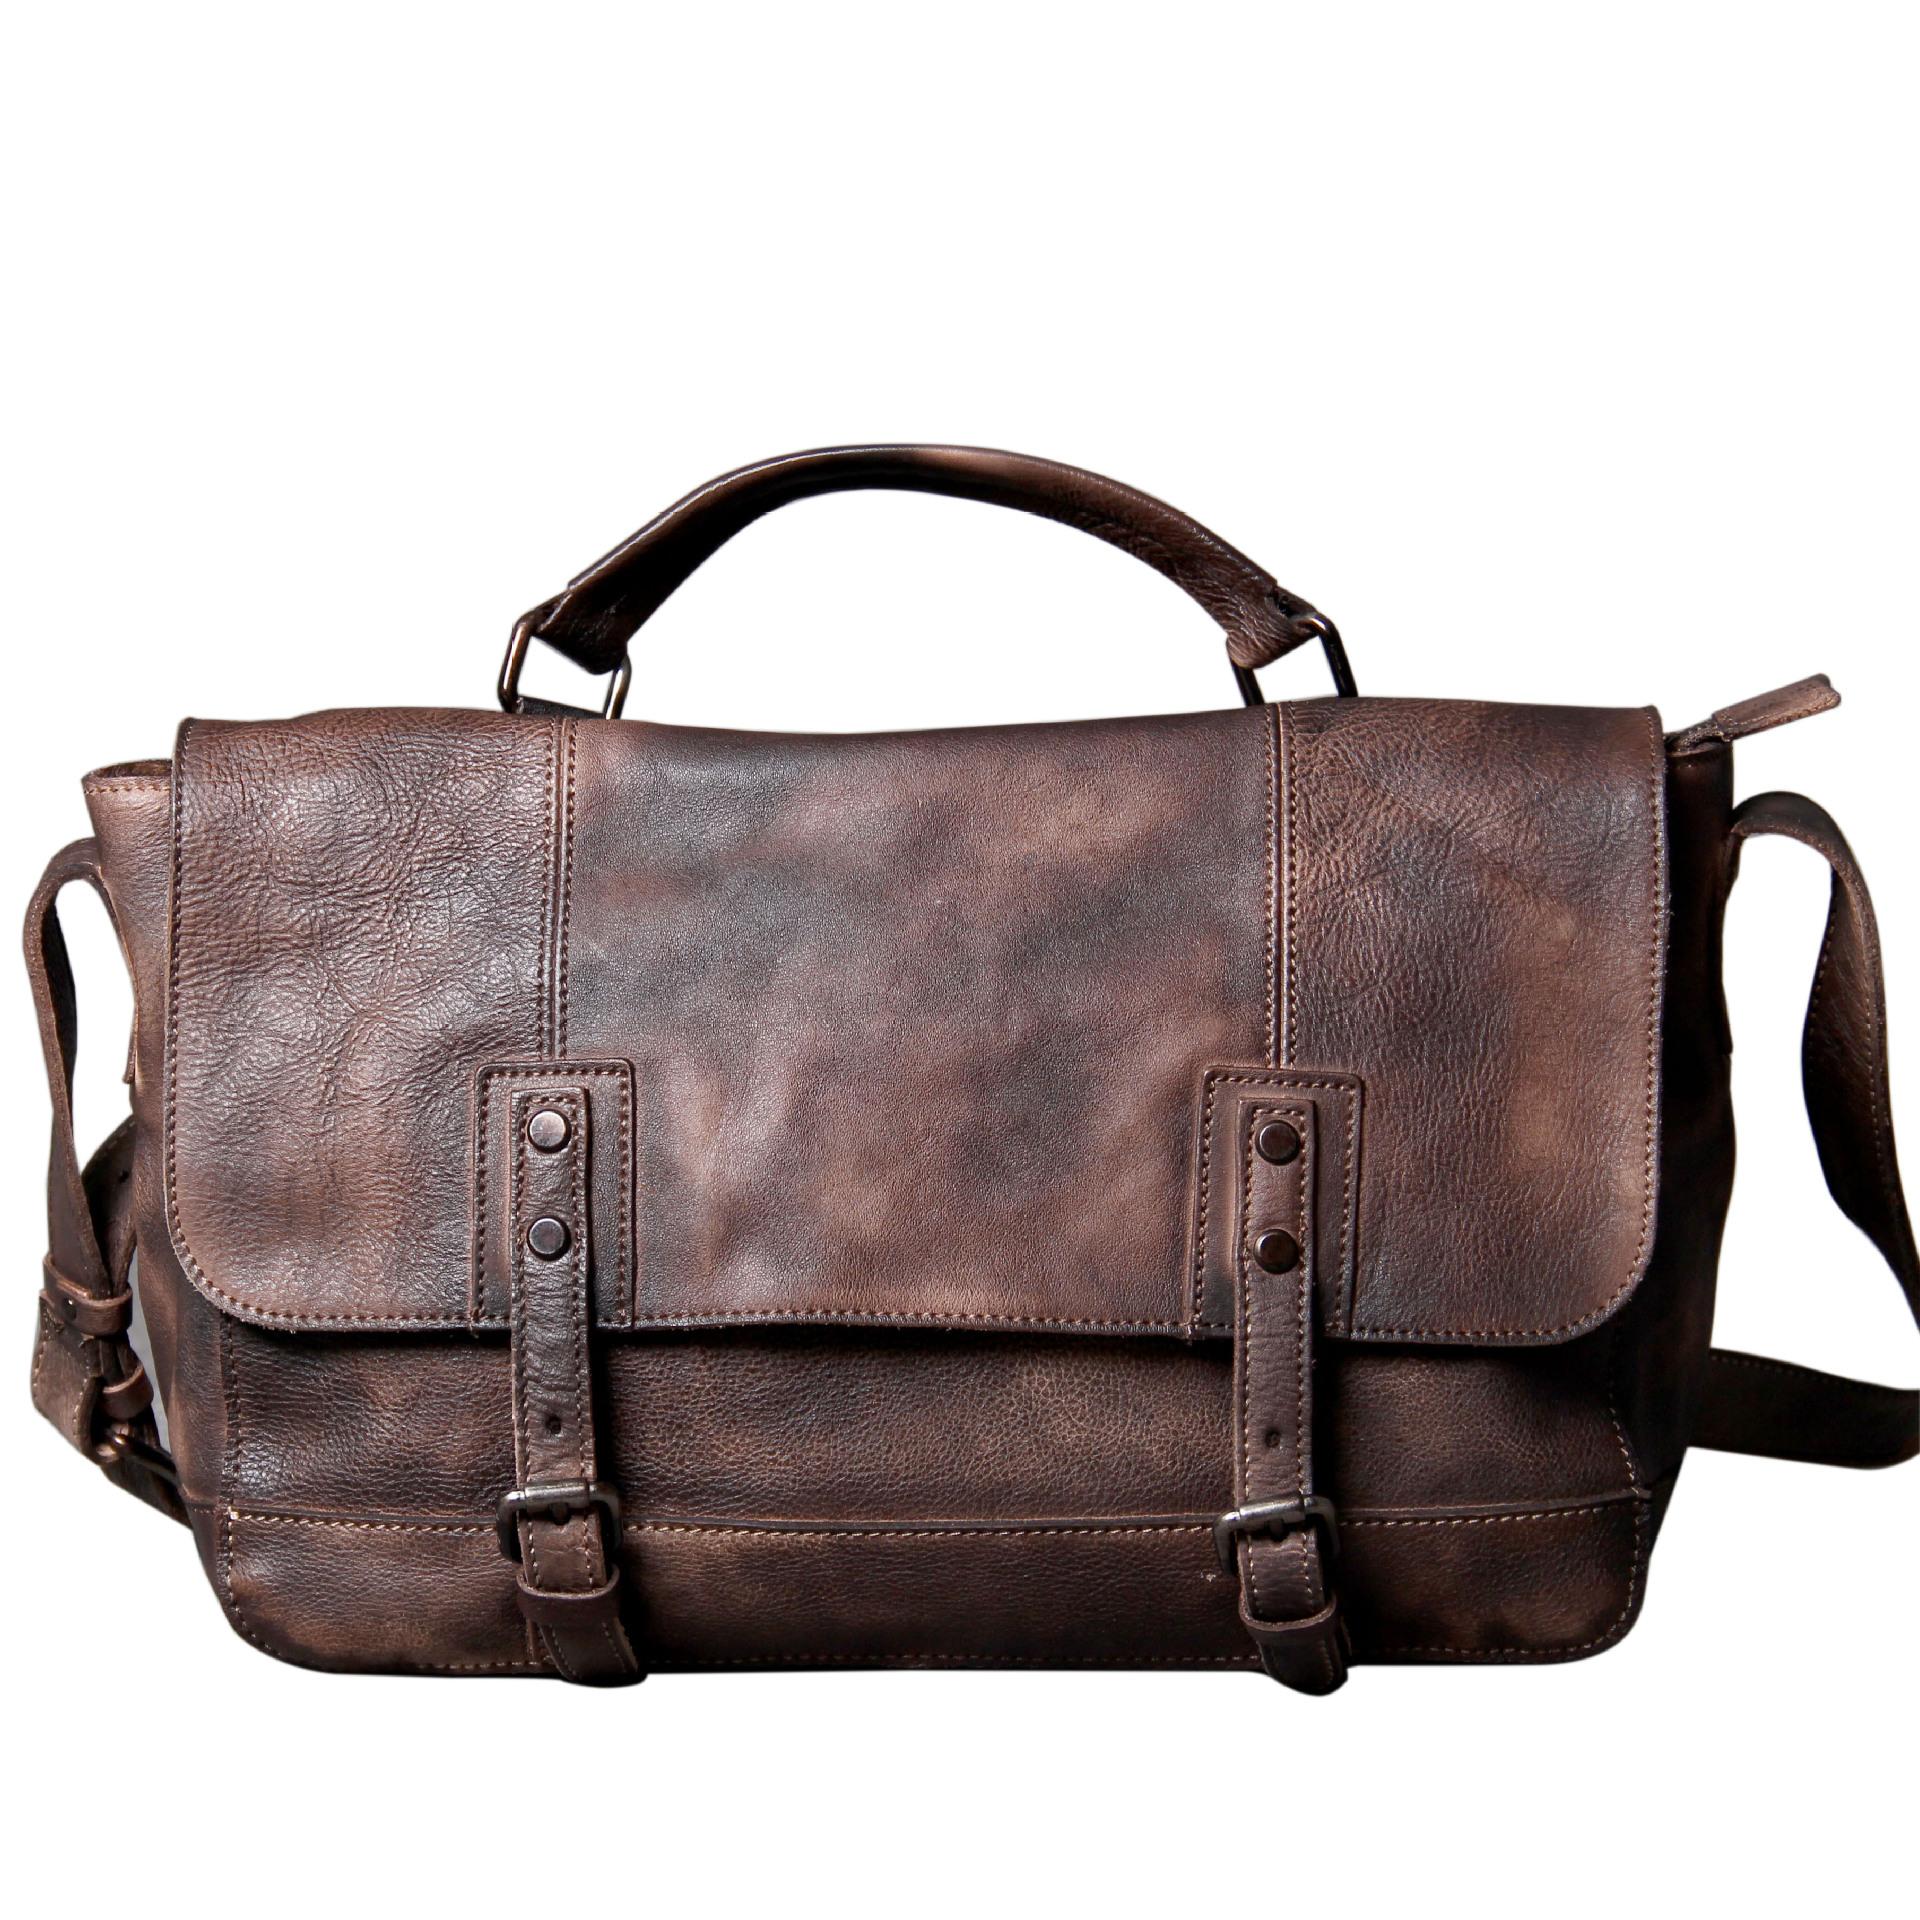 "Patina Brown Leather Messenger Bag ""Dux"" Men's Vintage Briefcase"